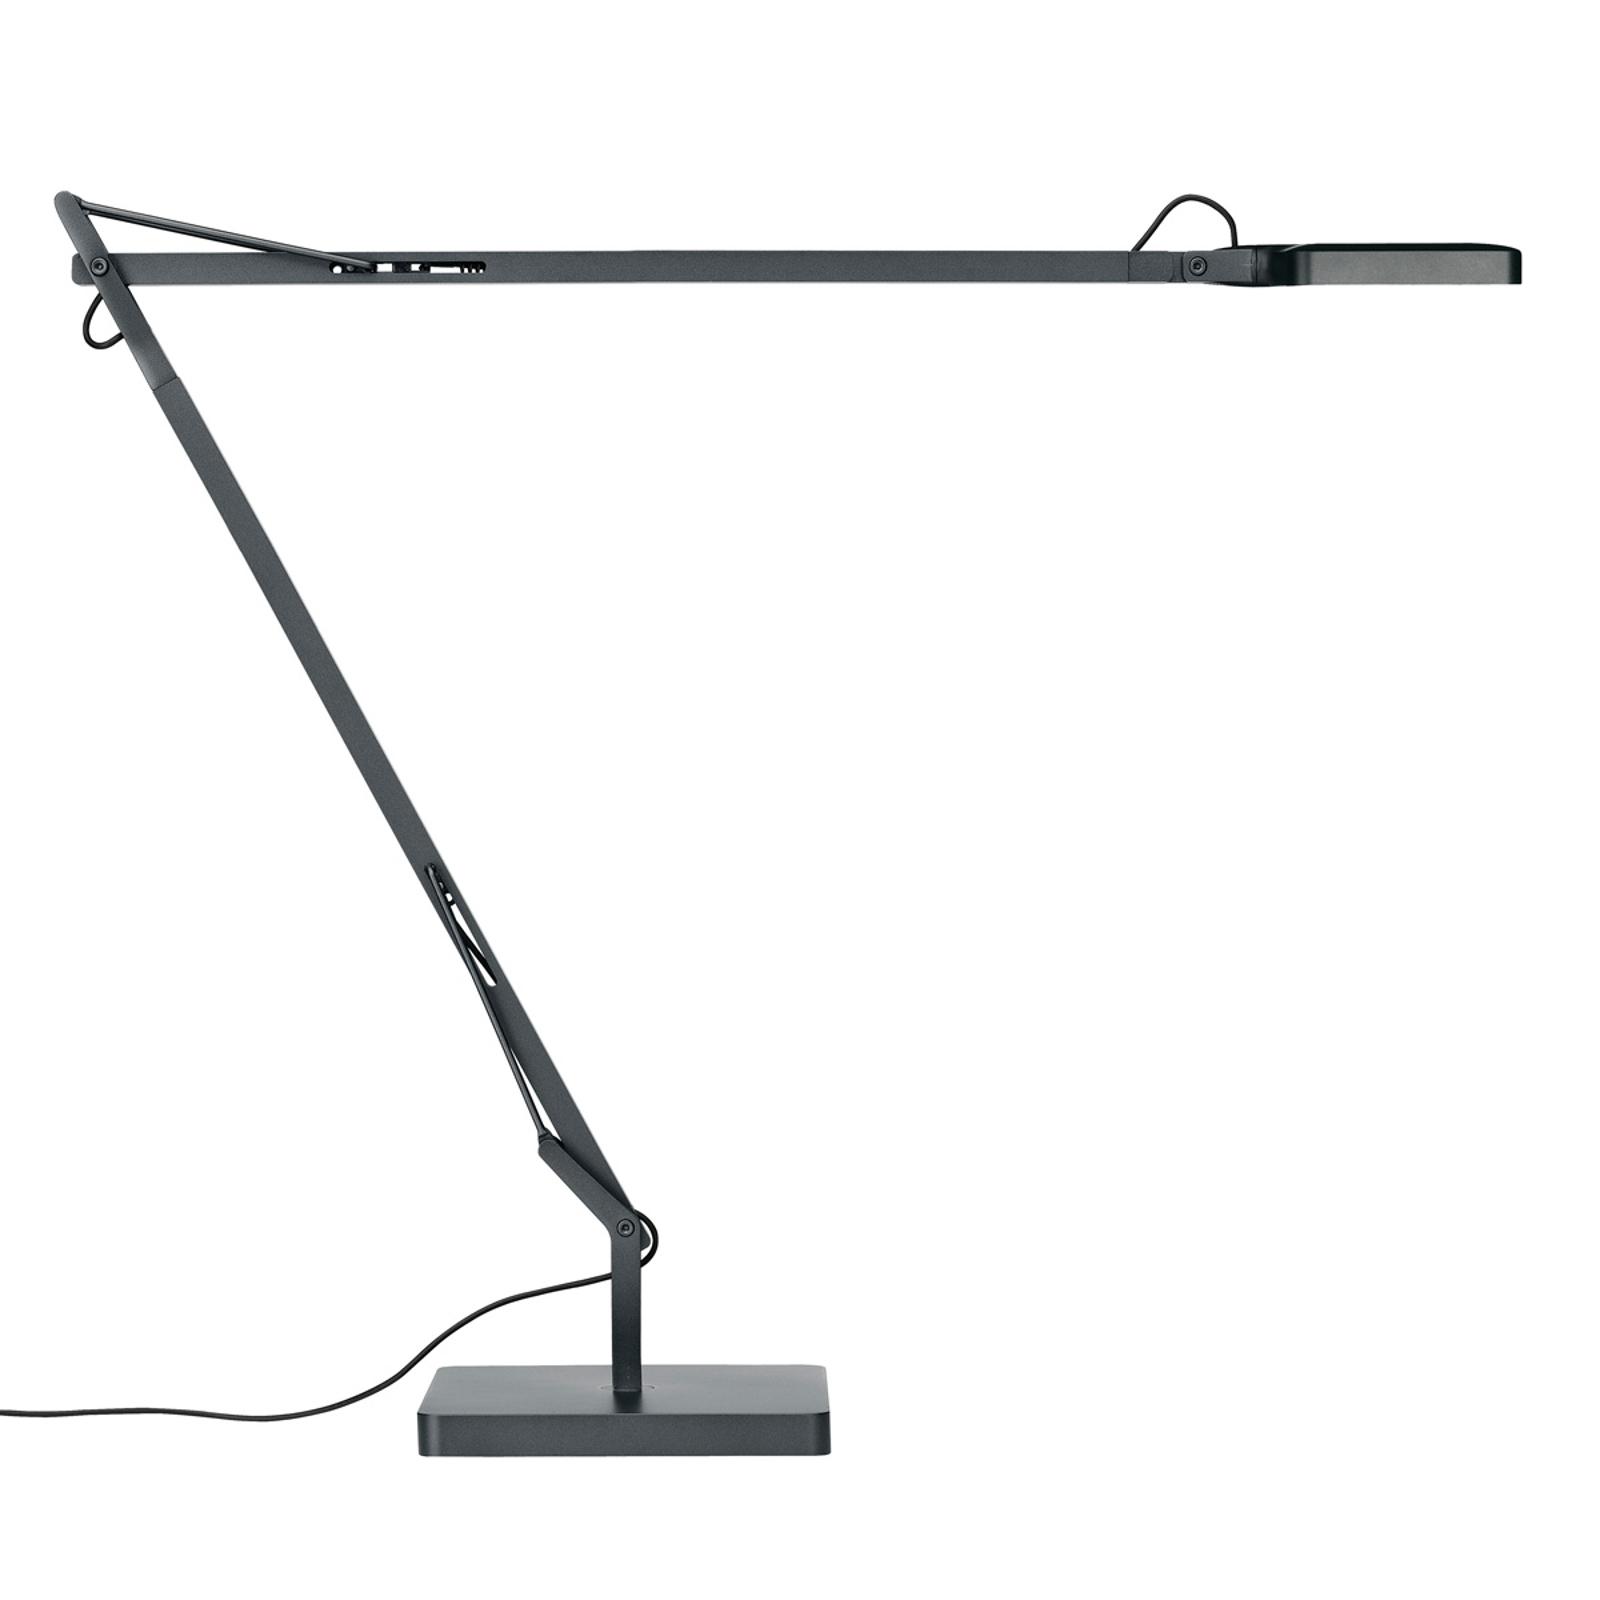 FLOS Kelvin LED-Tischleuchte in Anthrazit